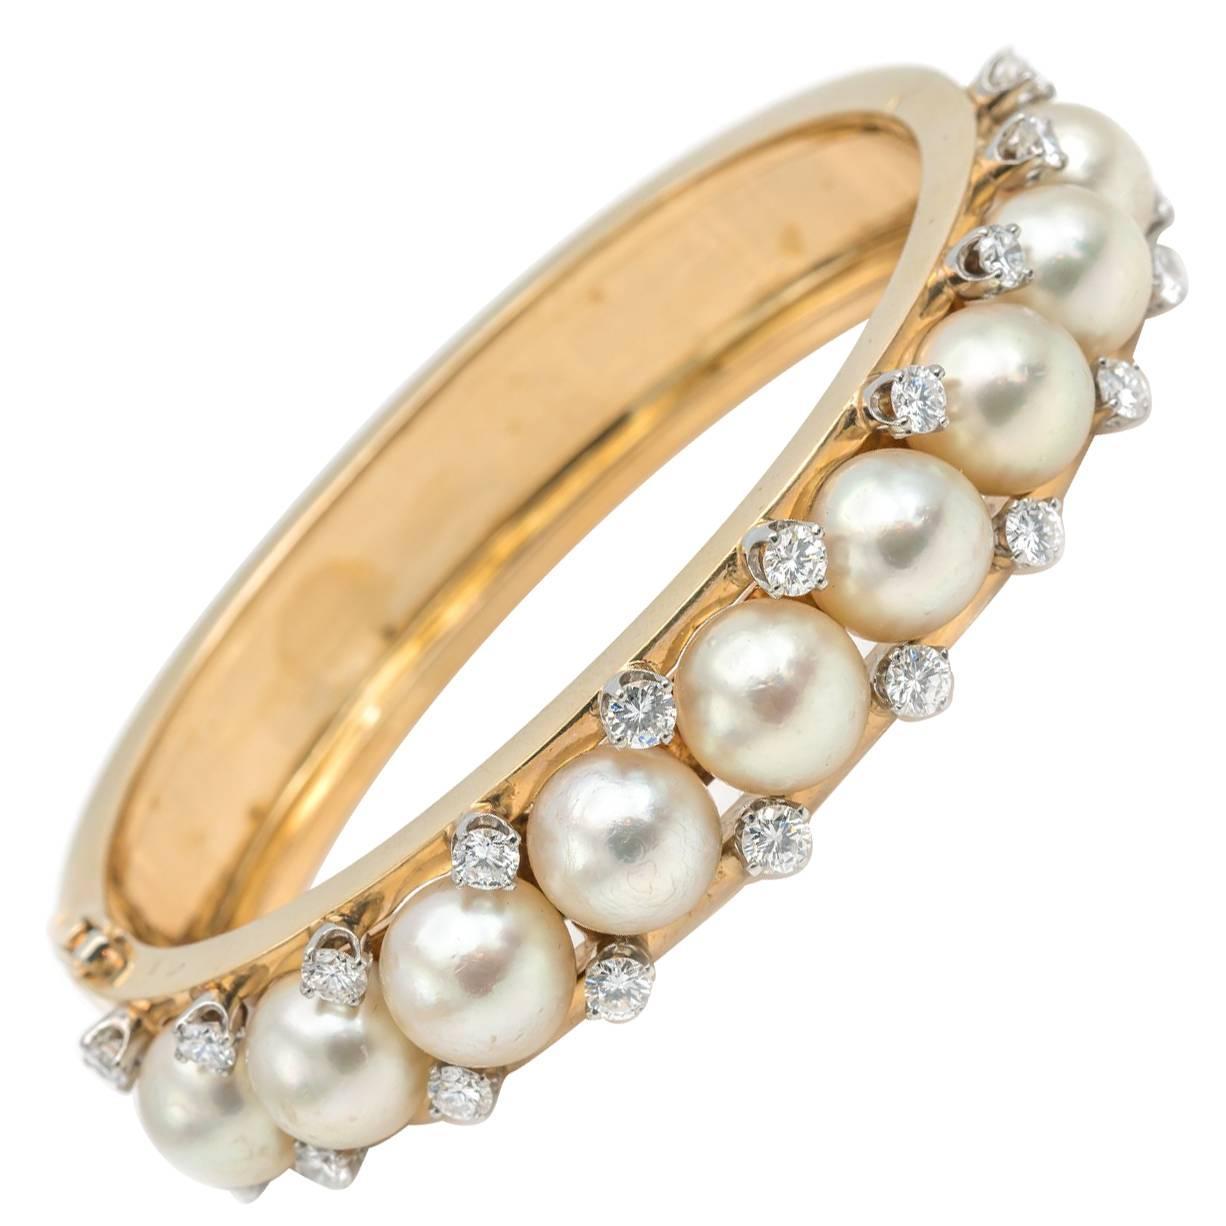 1950's Pearl and Diamond Gold Bangle Bracelet